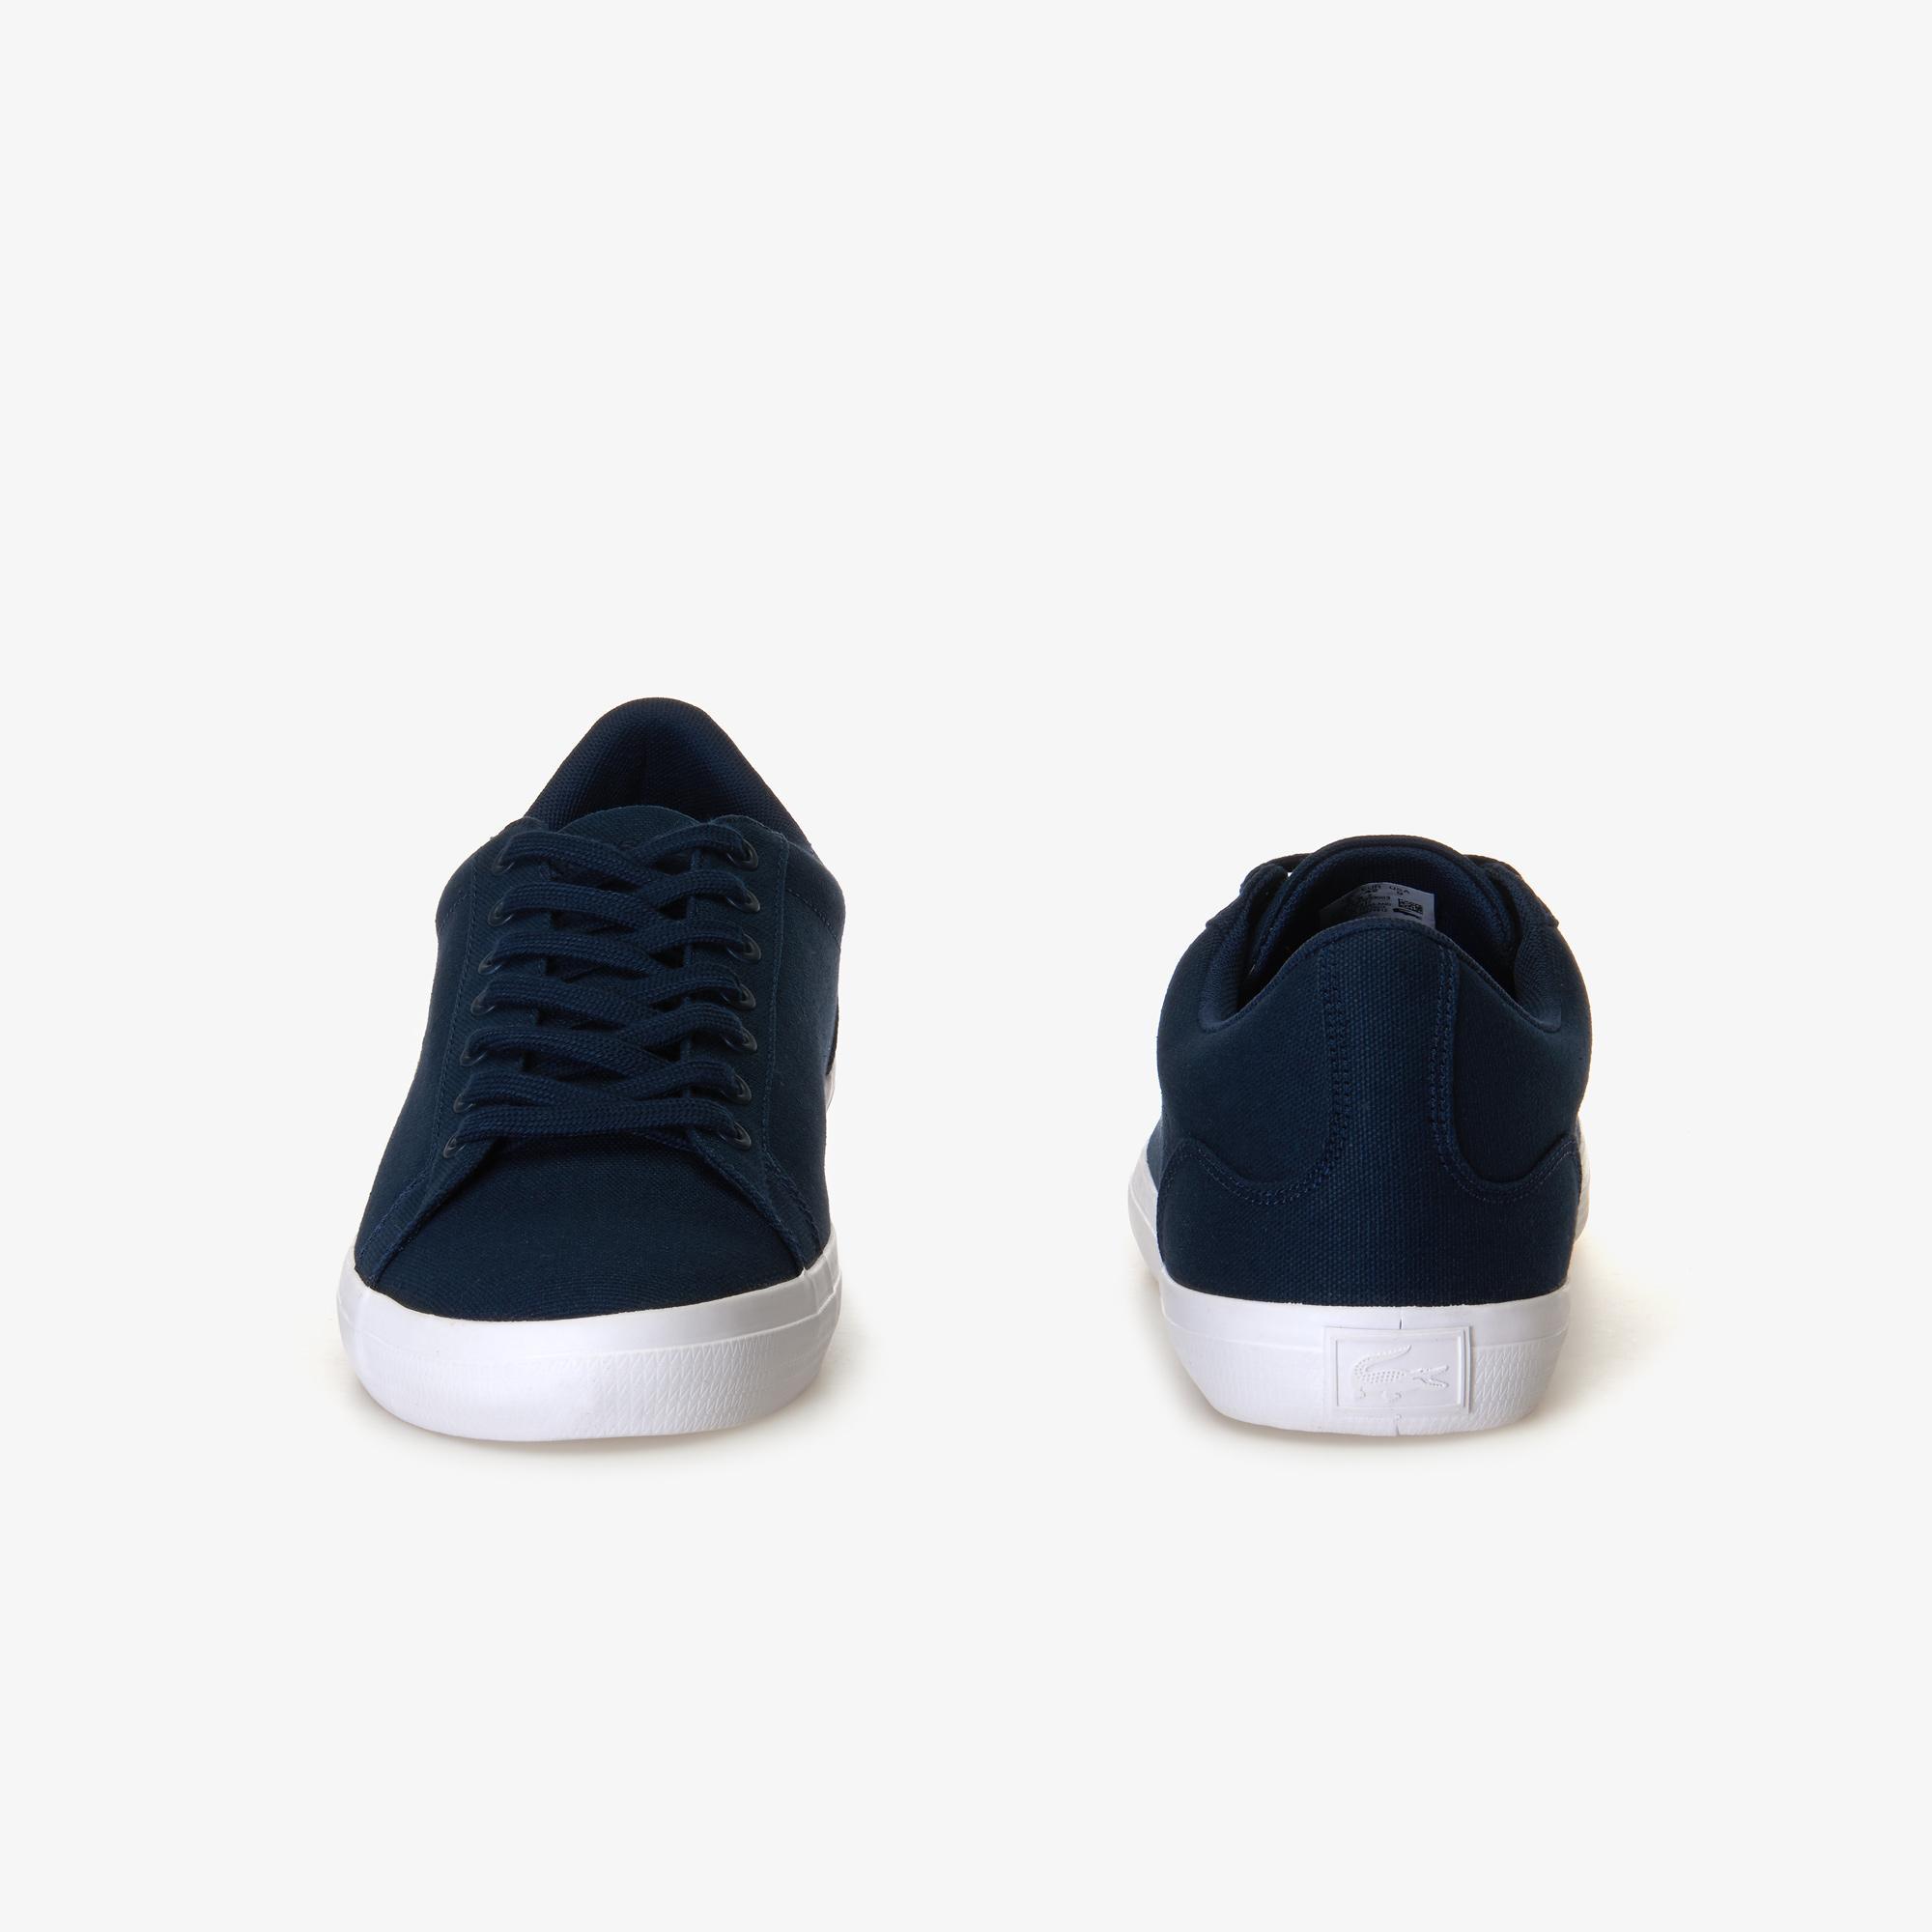 Lacoste Men's Lerond Canvas Sneakers